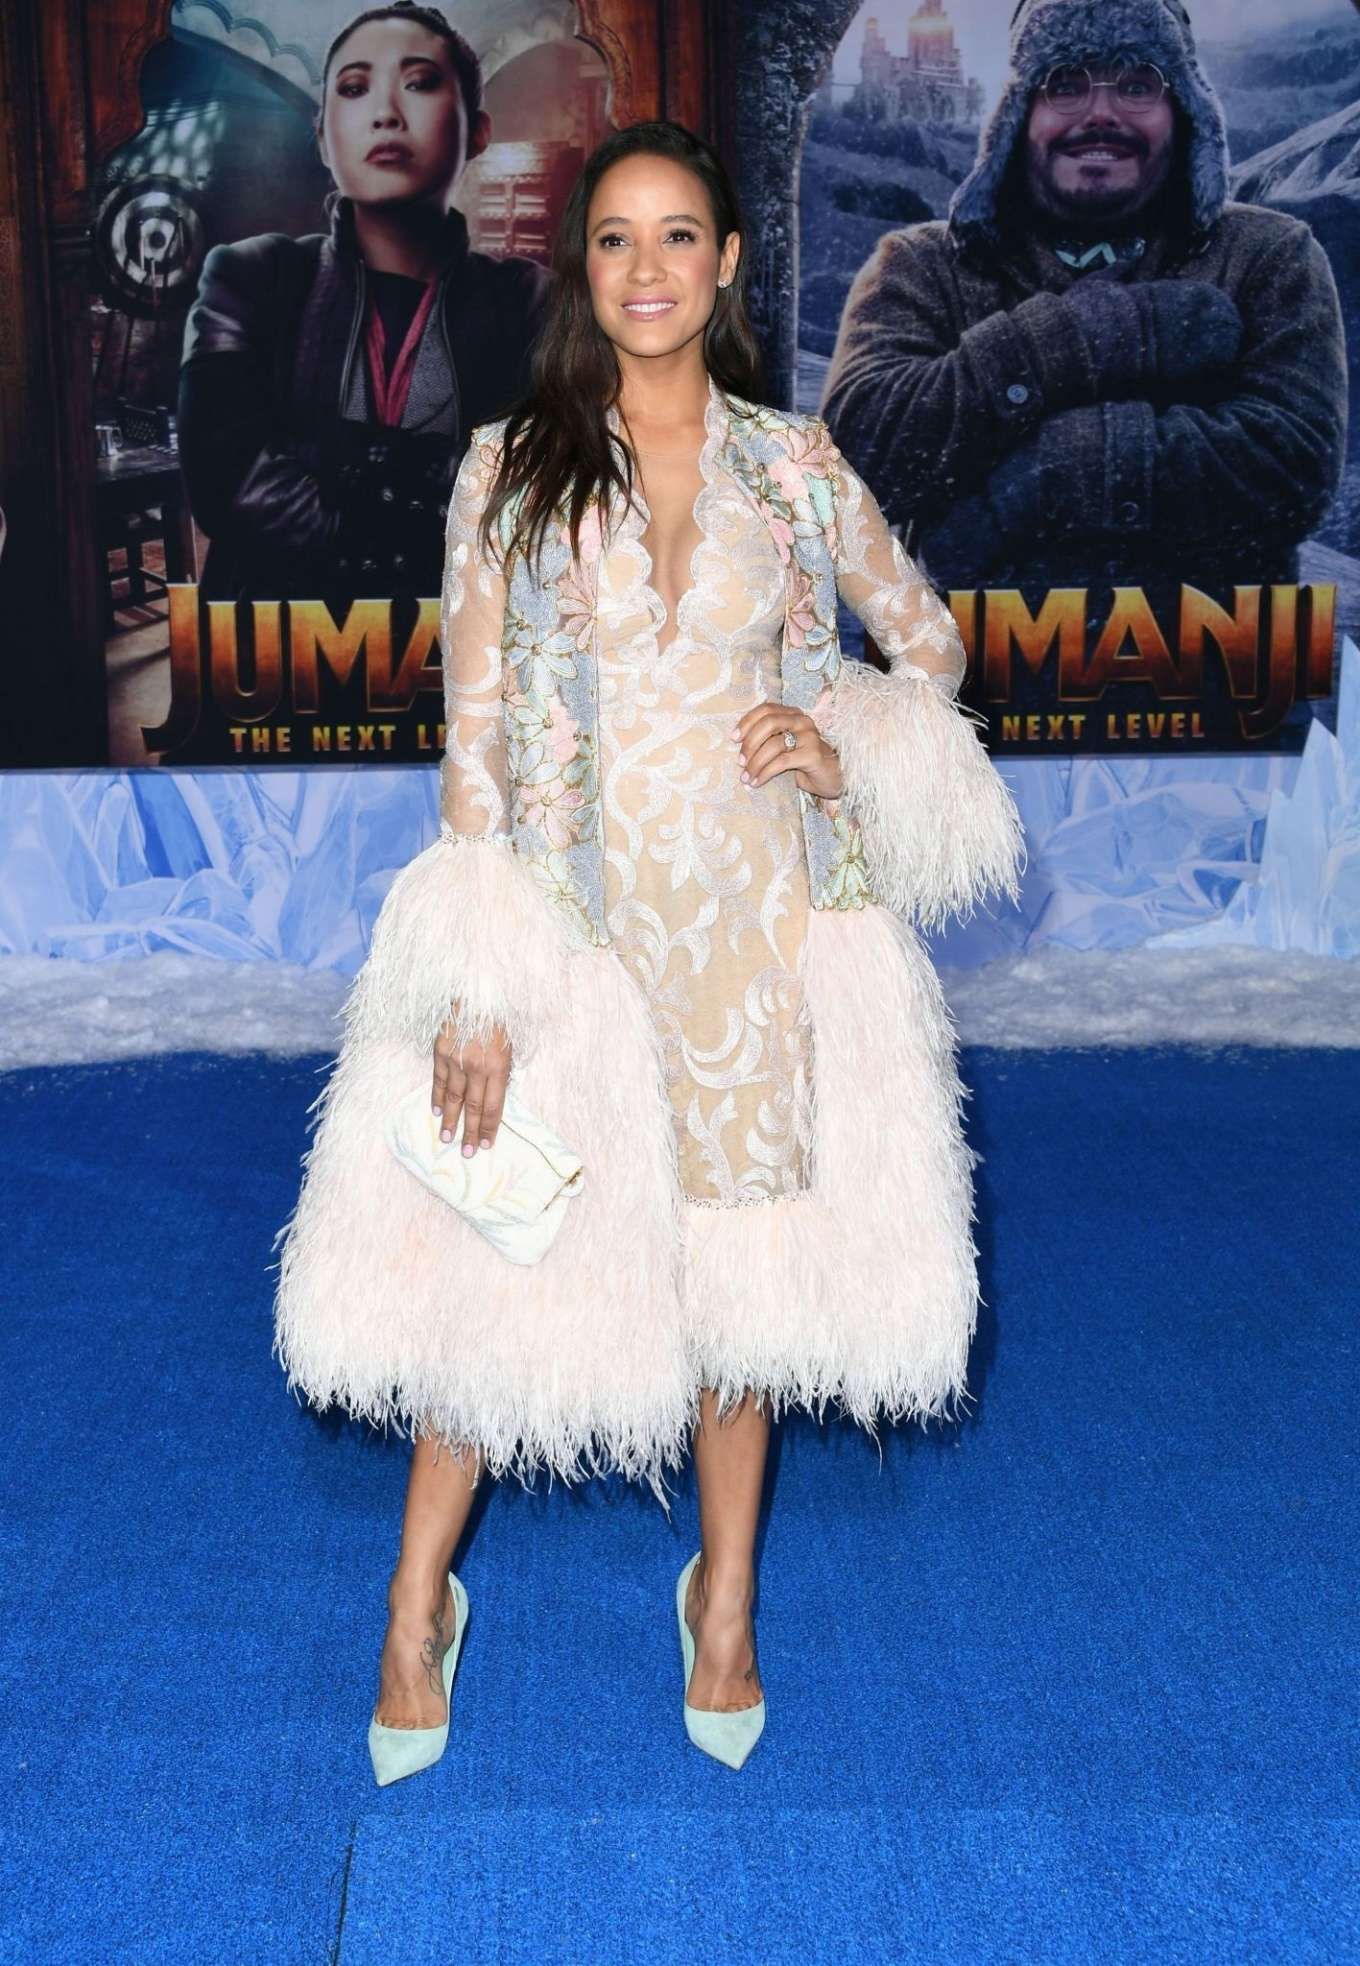 Dania Ramirez 2019 : Dania Ramirez – Jumanji: The Next Level premiere in Hollywood-03